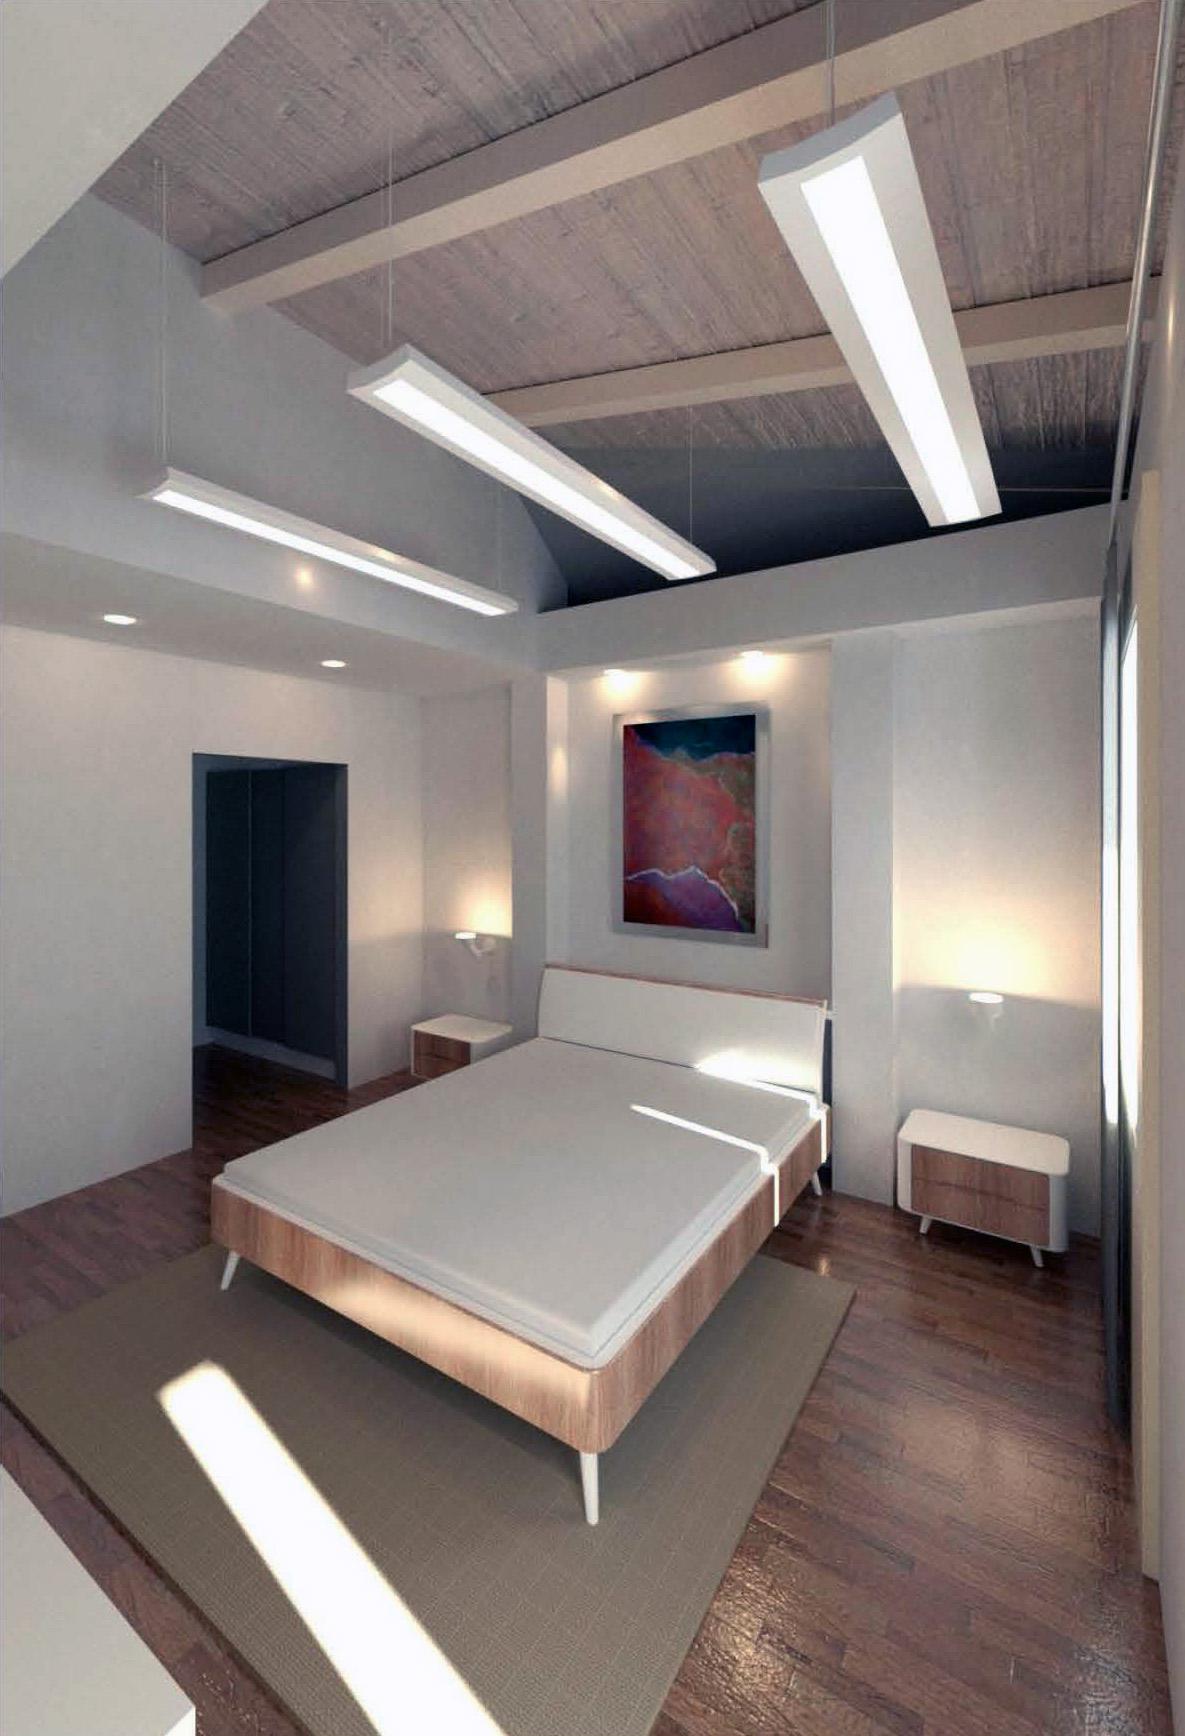 lefkada_interiors_attic_masterbdr_02.jpg